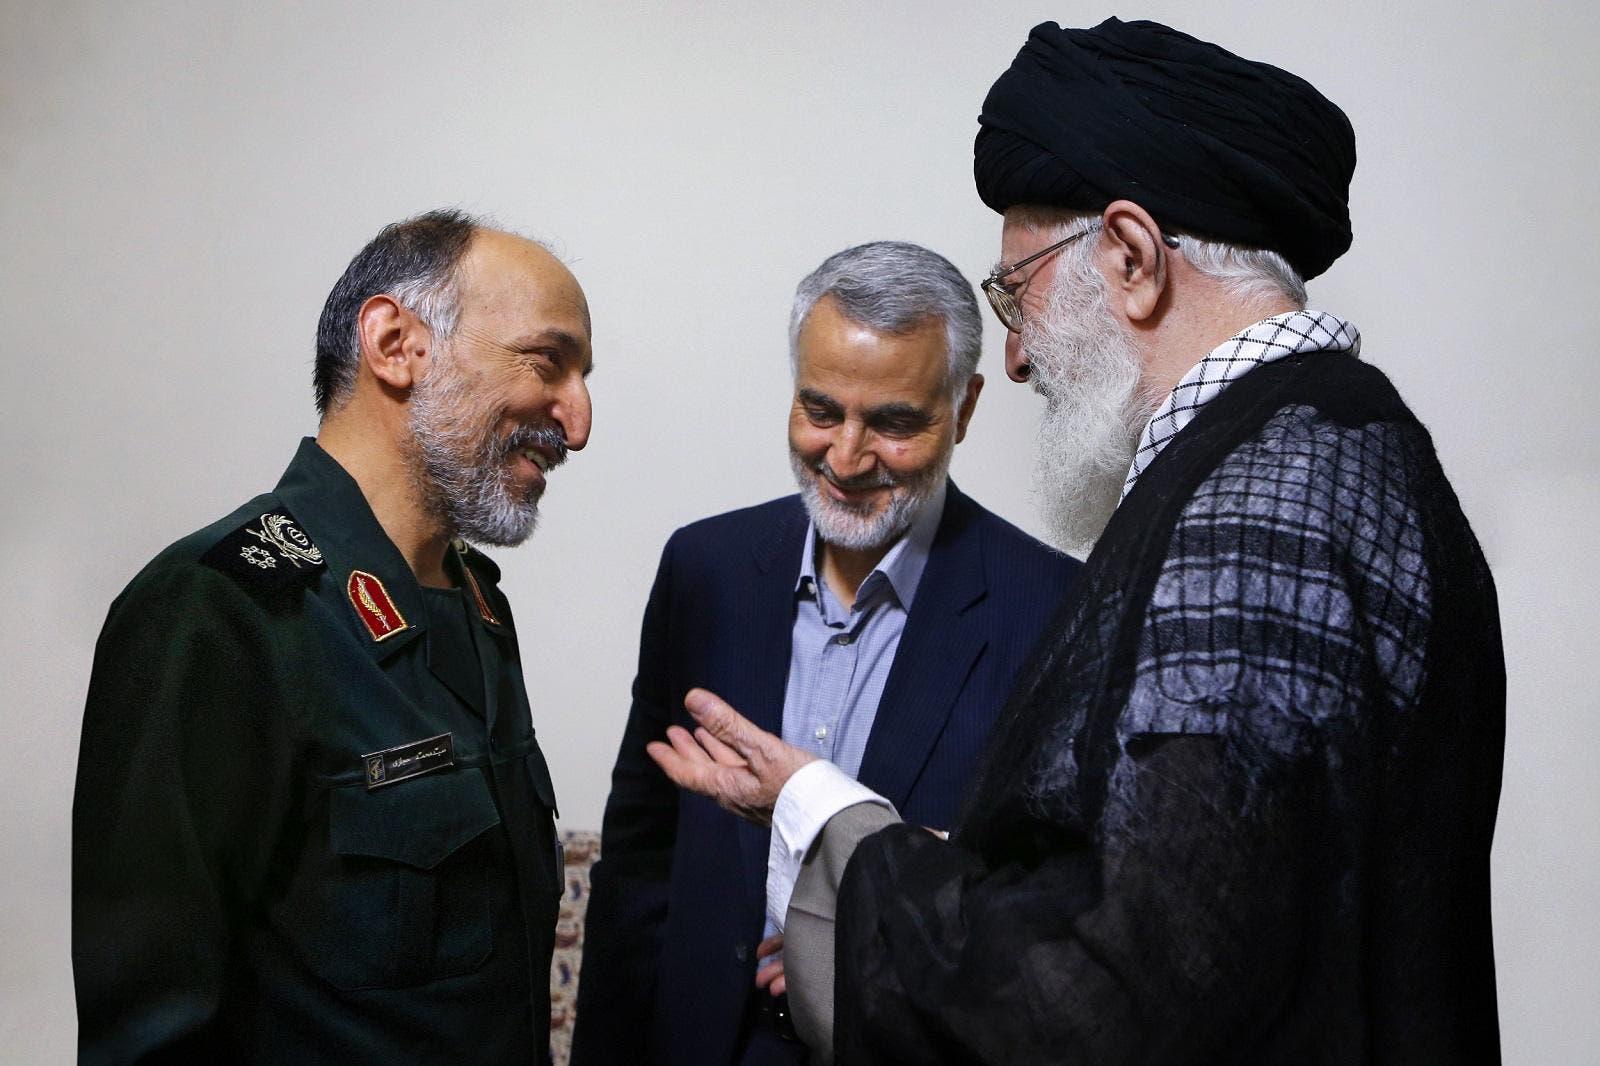 (L-R) Mohammad Hejazi, Qassem Soleimani, and Ali Khamenei in an undated photo. (Source: Khamenei.ir)